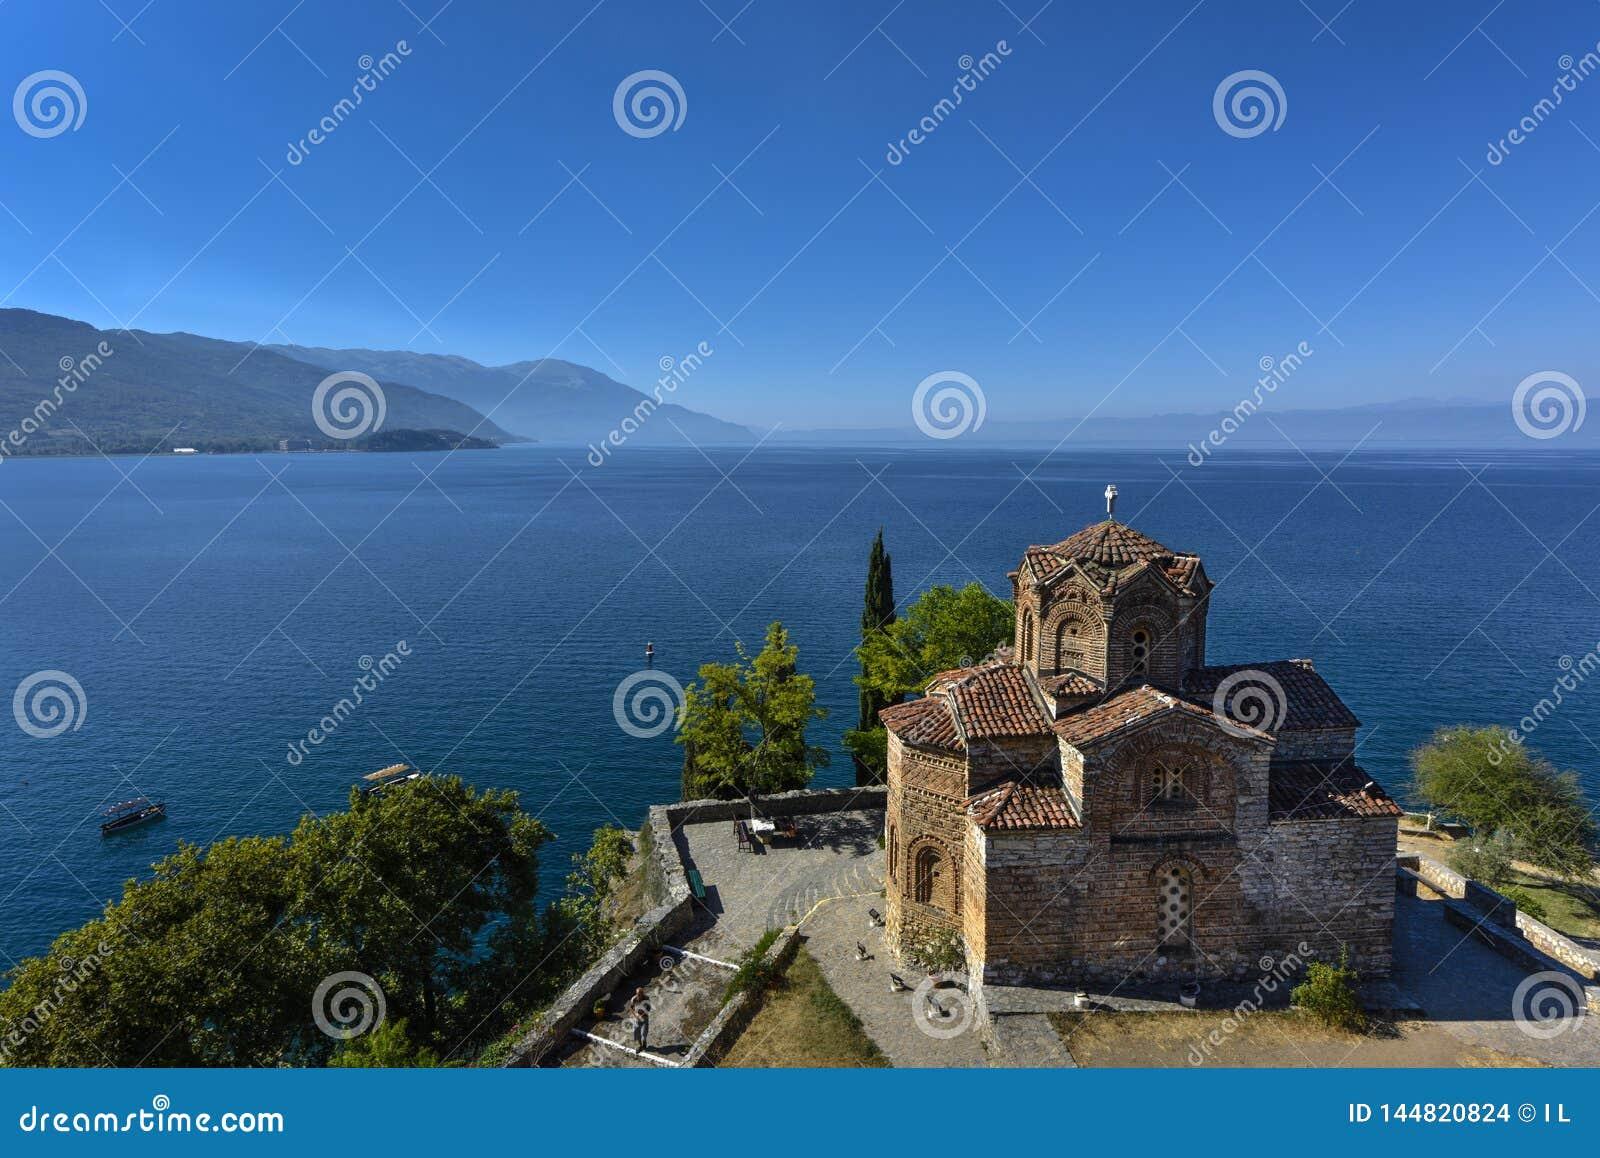 Saint John - Kaneo, orthodoxe Kirche in Ohrid rief auch Sveti-Heiliges Jovan Kaneo, Mazedonien an